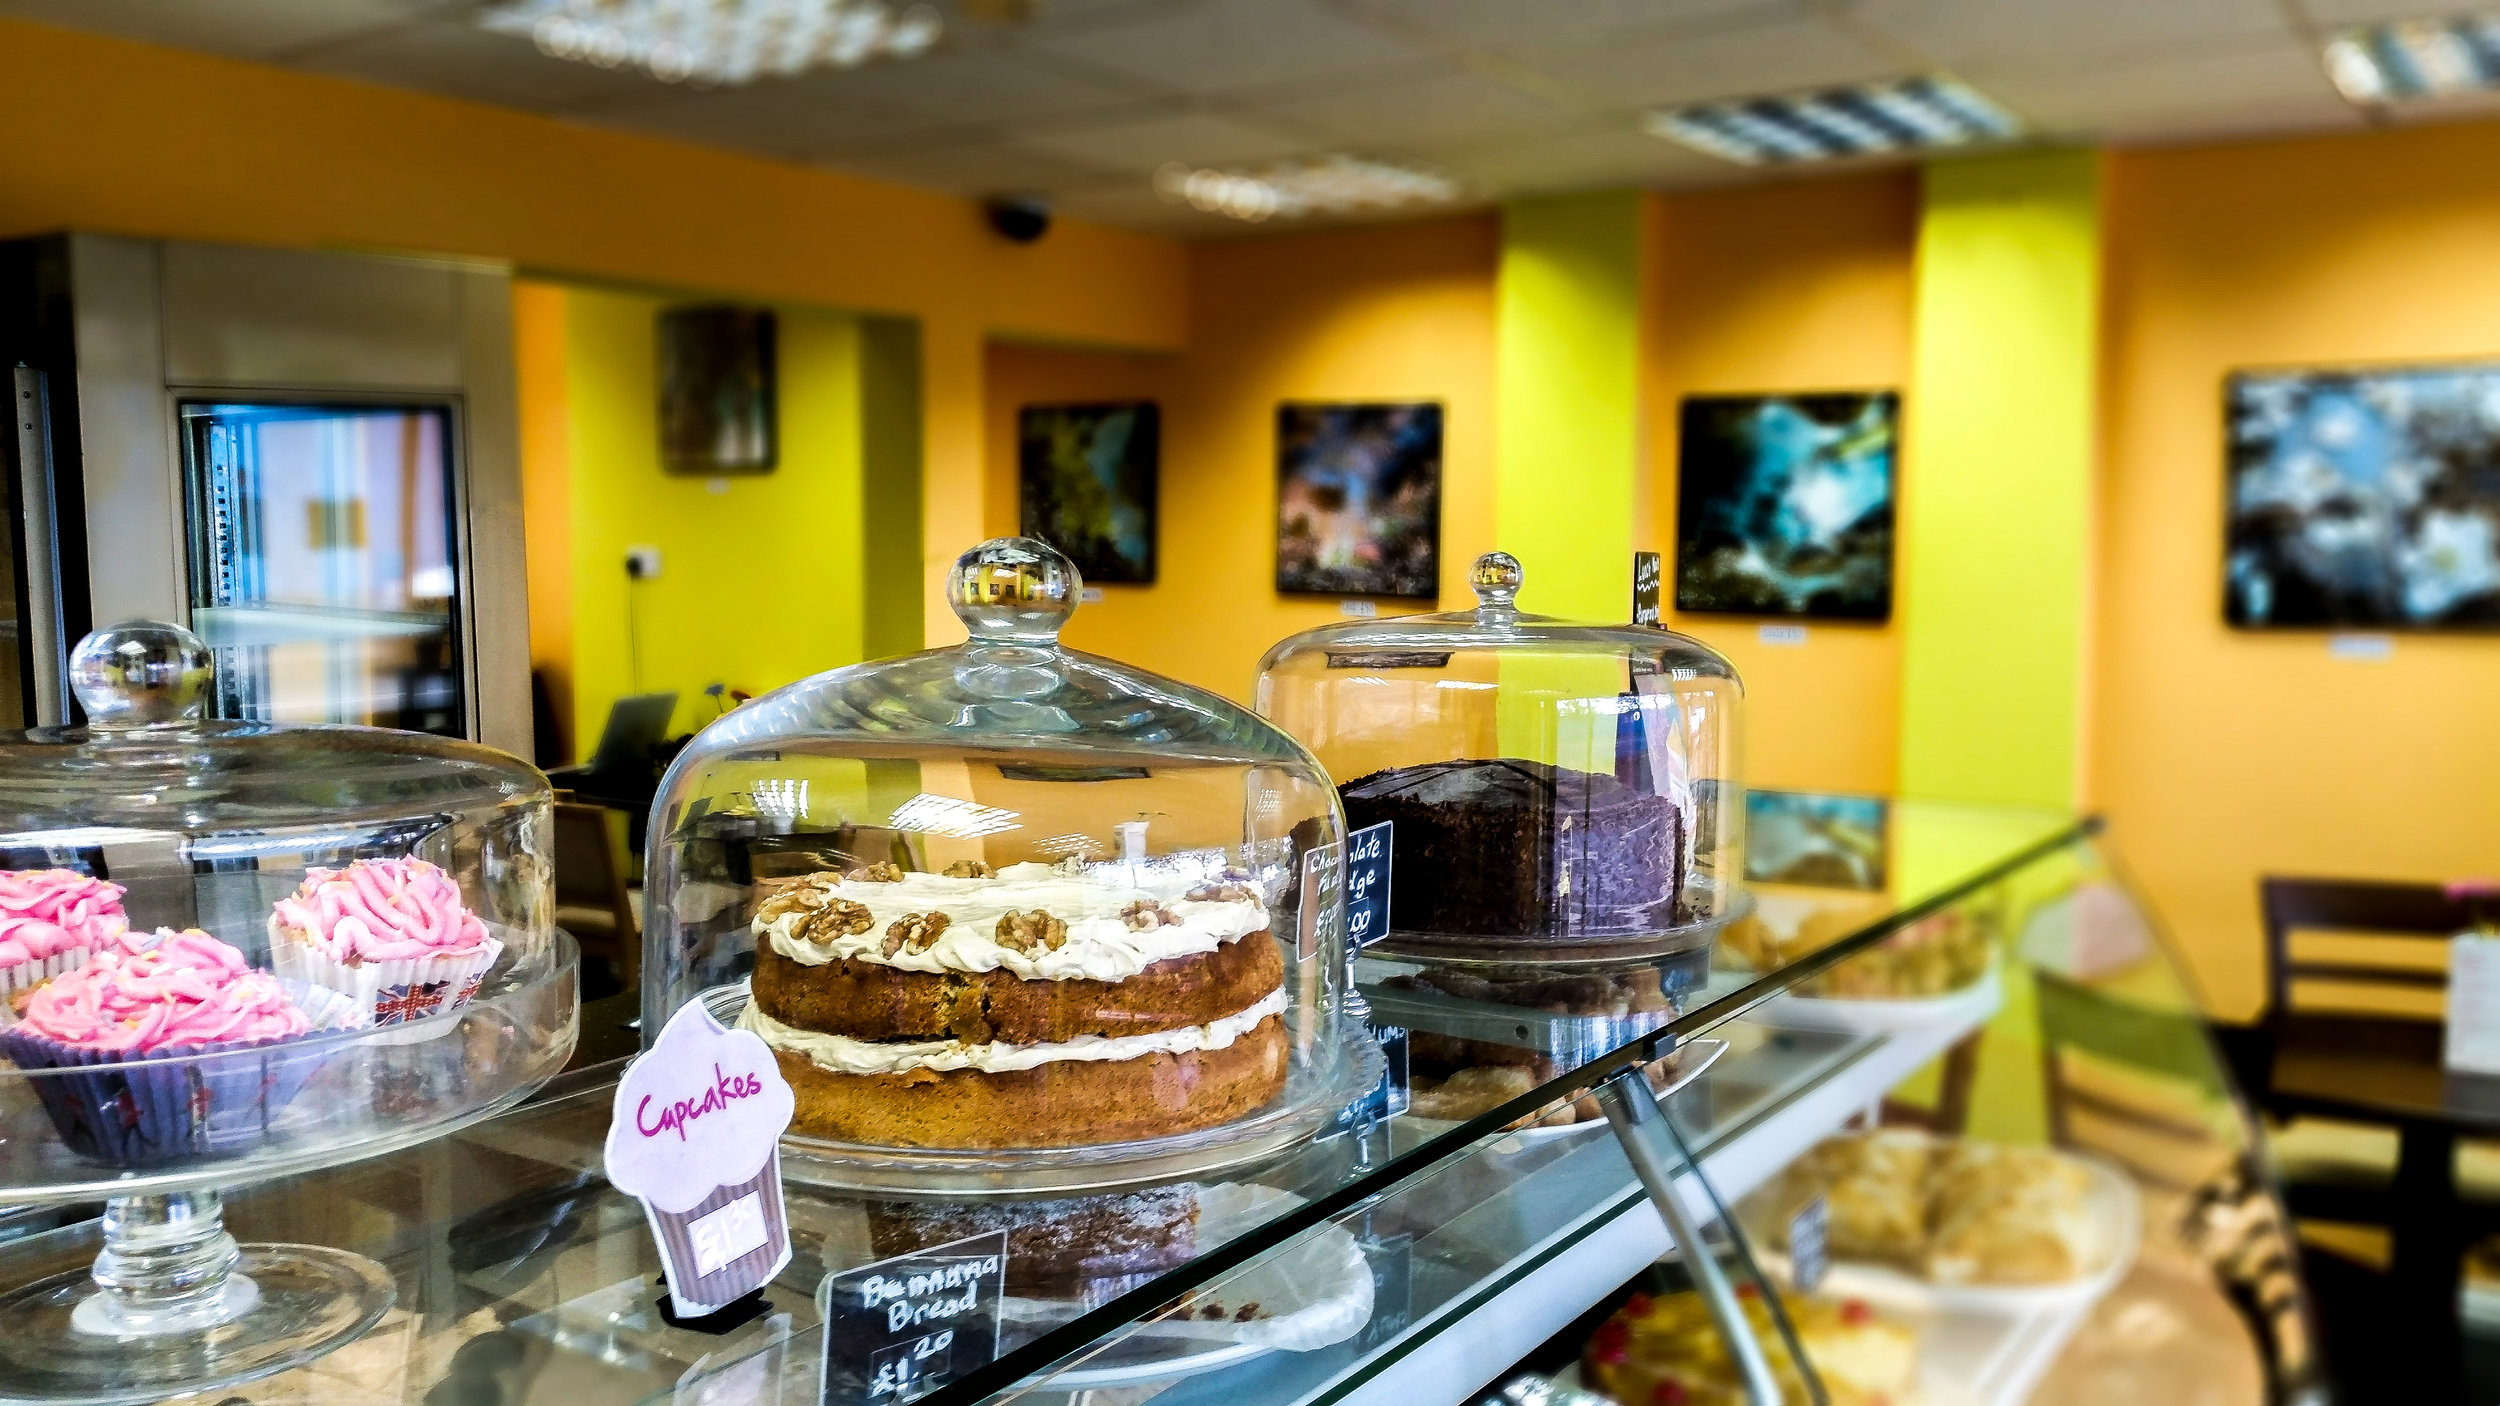 Piece of Cake Cafe Dulwich South London Club